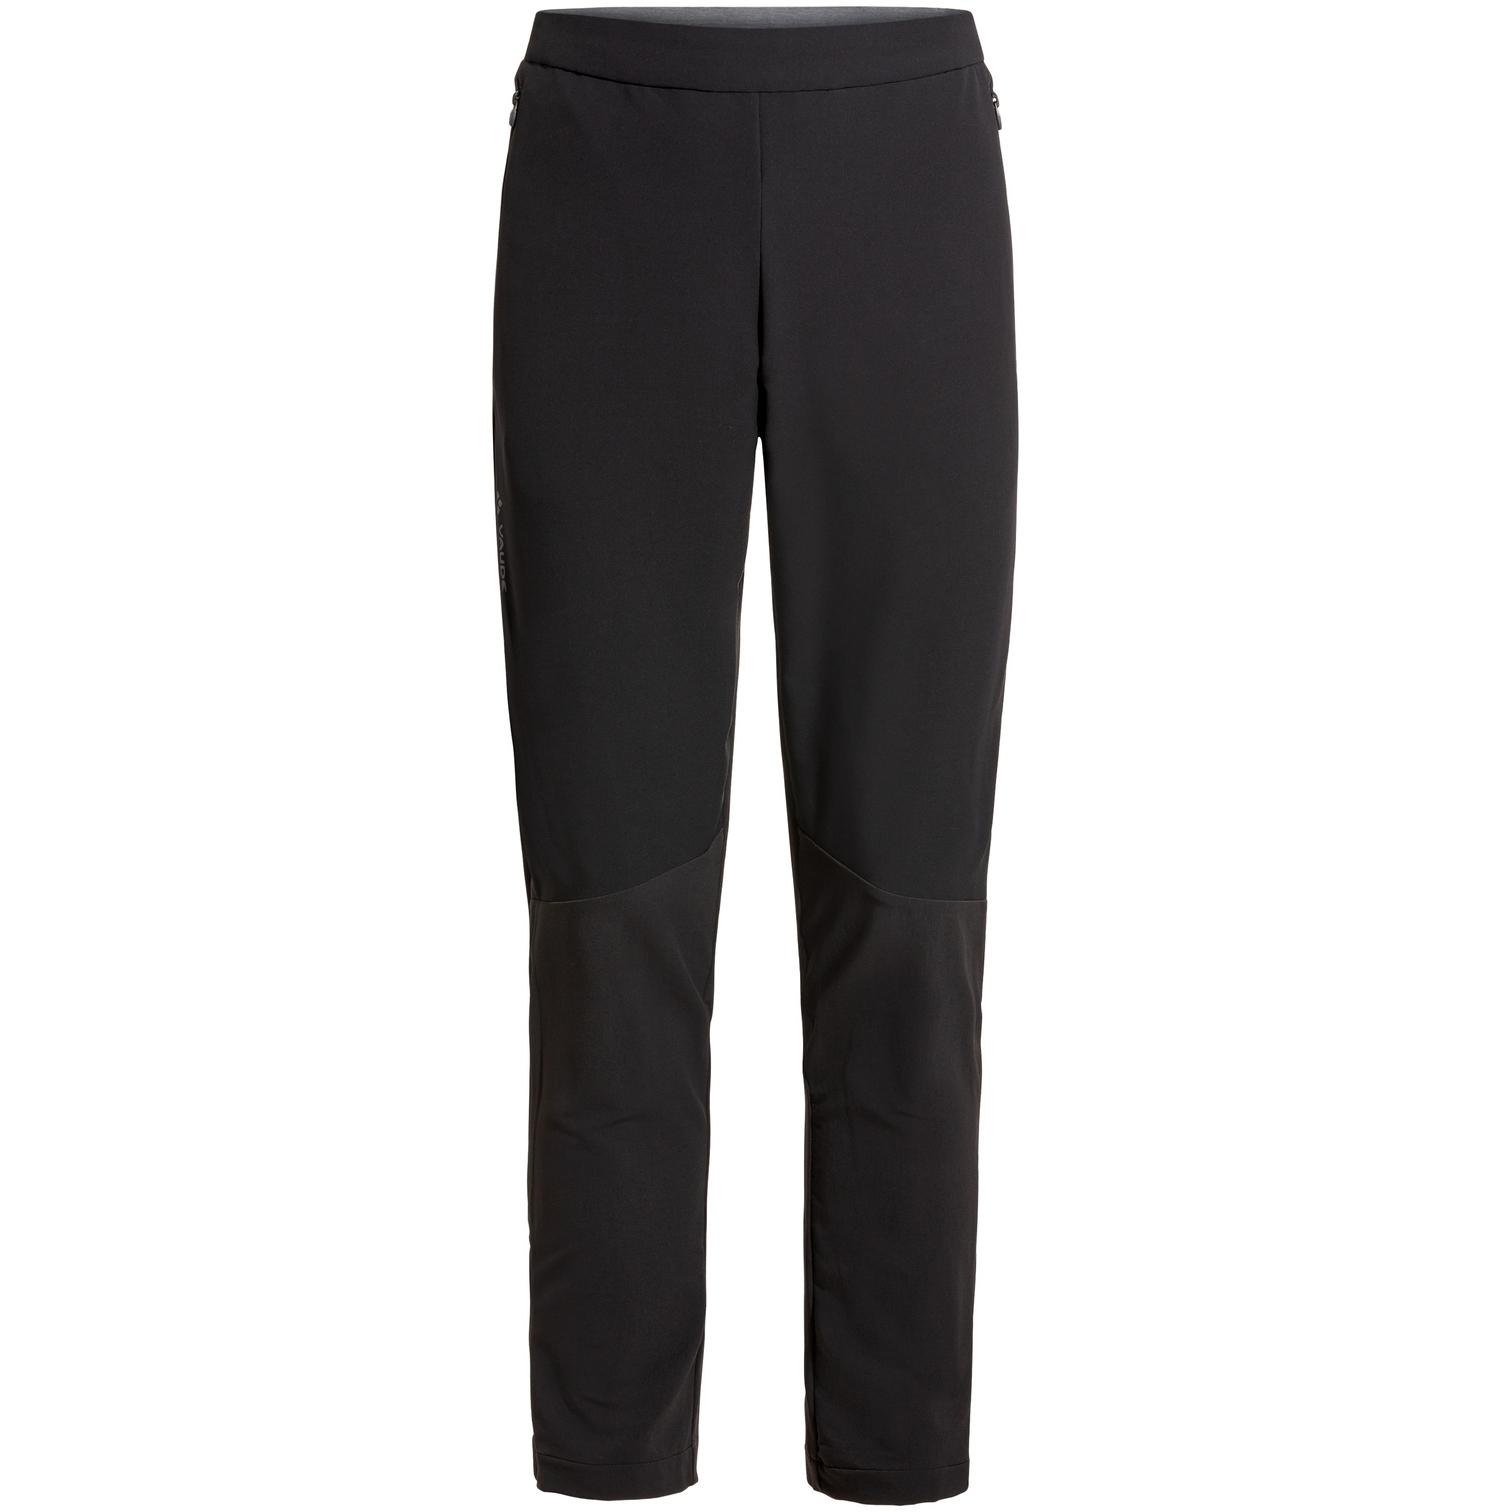 Vaude Men's Cyclist Hybrid Pants - black